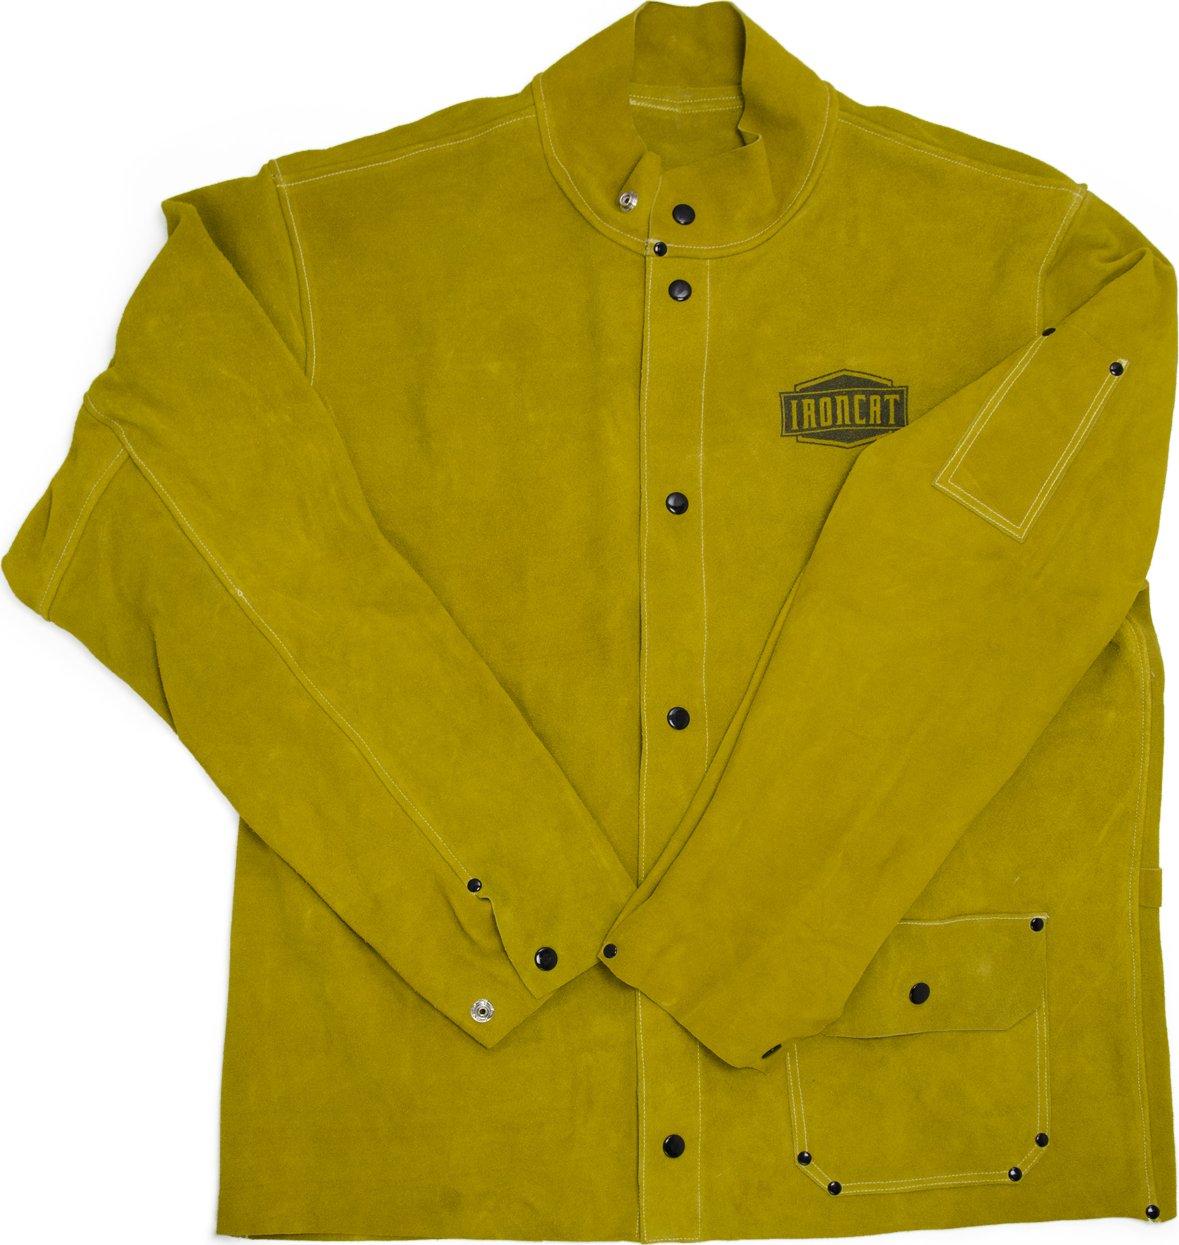 West Chester IRONCAT 7005 Heat Resistant Split Cowhide Leather Welding Jacket, XX-Large